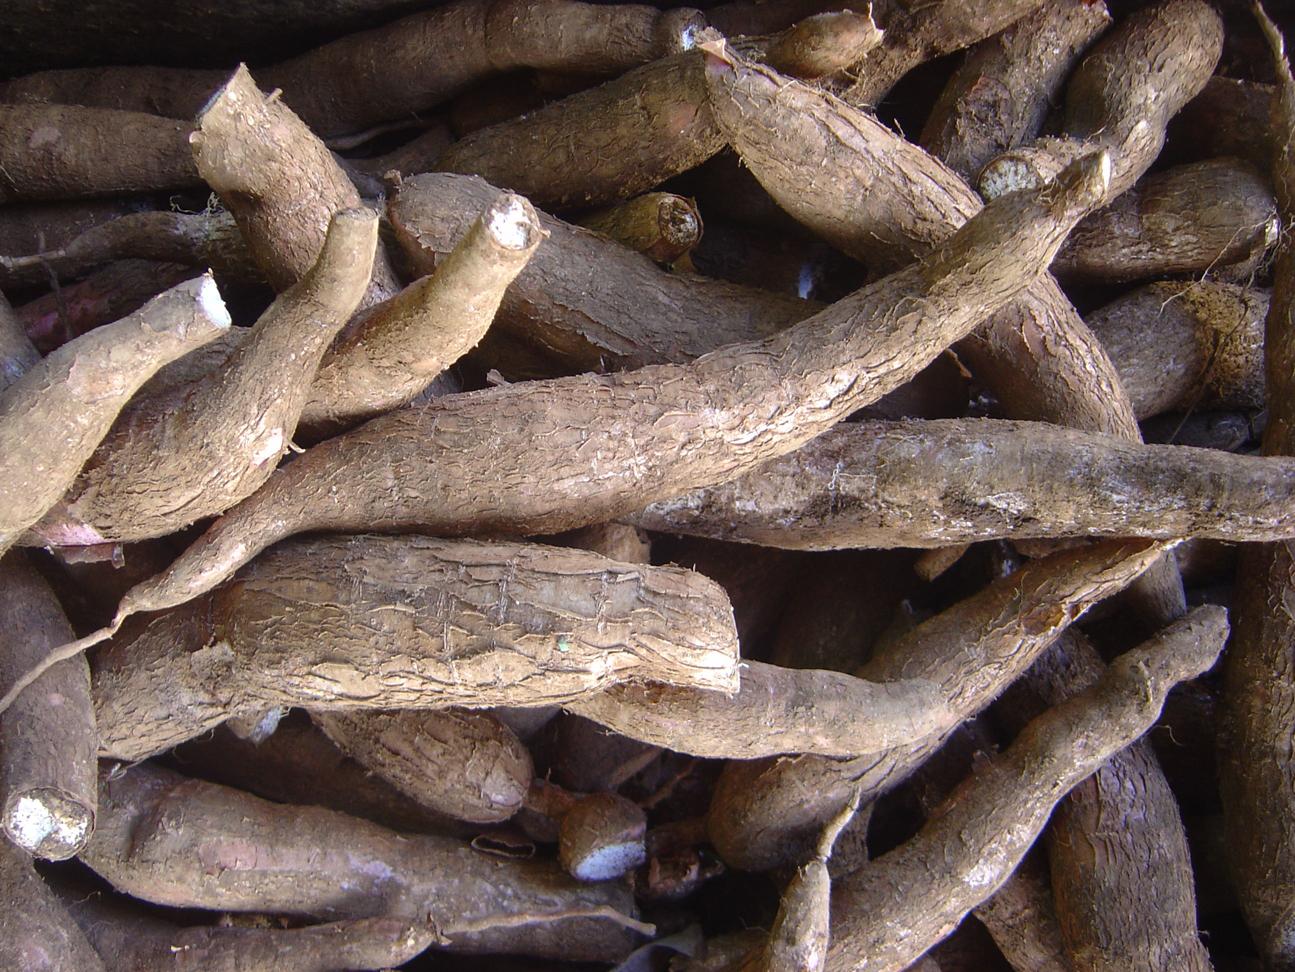 Health benefits of cassava - Cassava Root